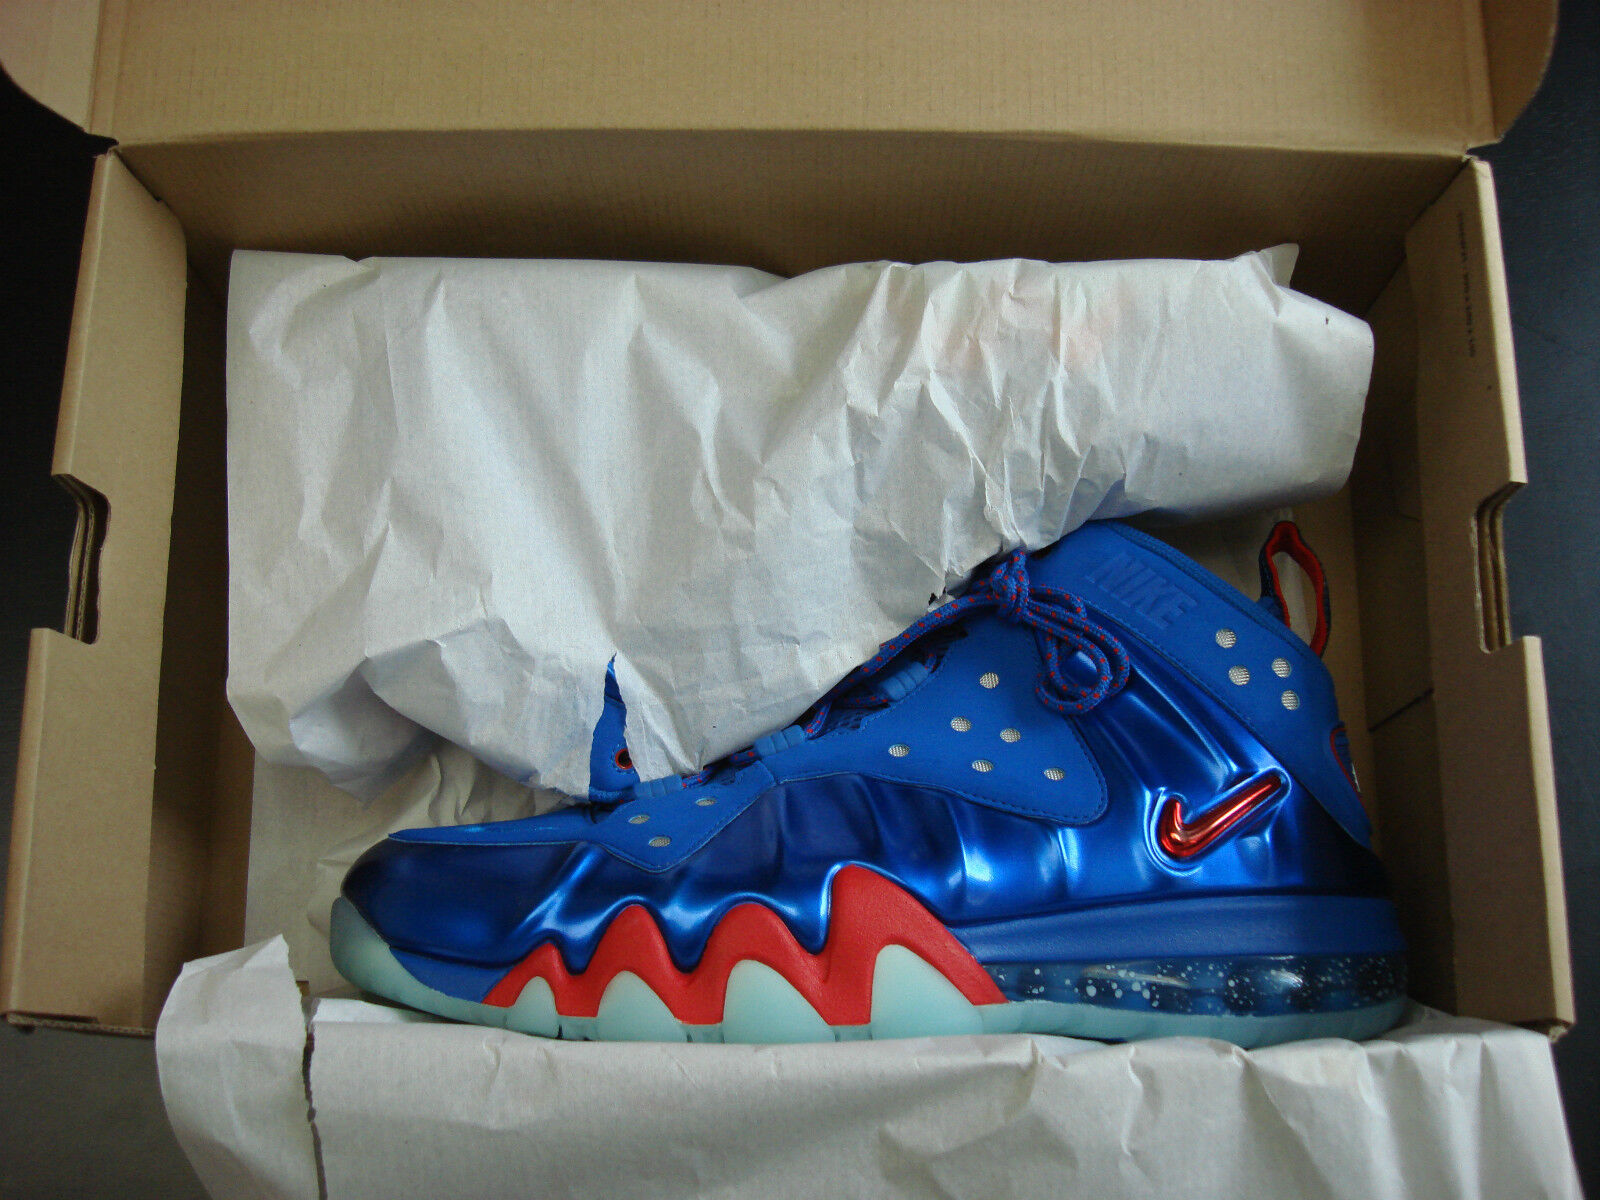 Nike chuckposite blau energie / feuer sz 11 sz11 blau chuckposite posite max db3aec